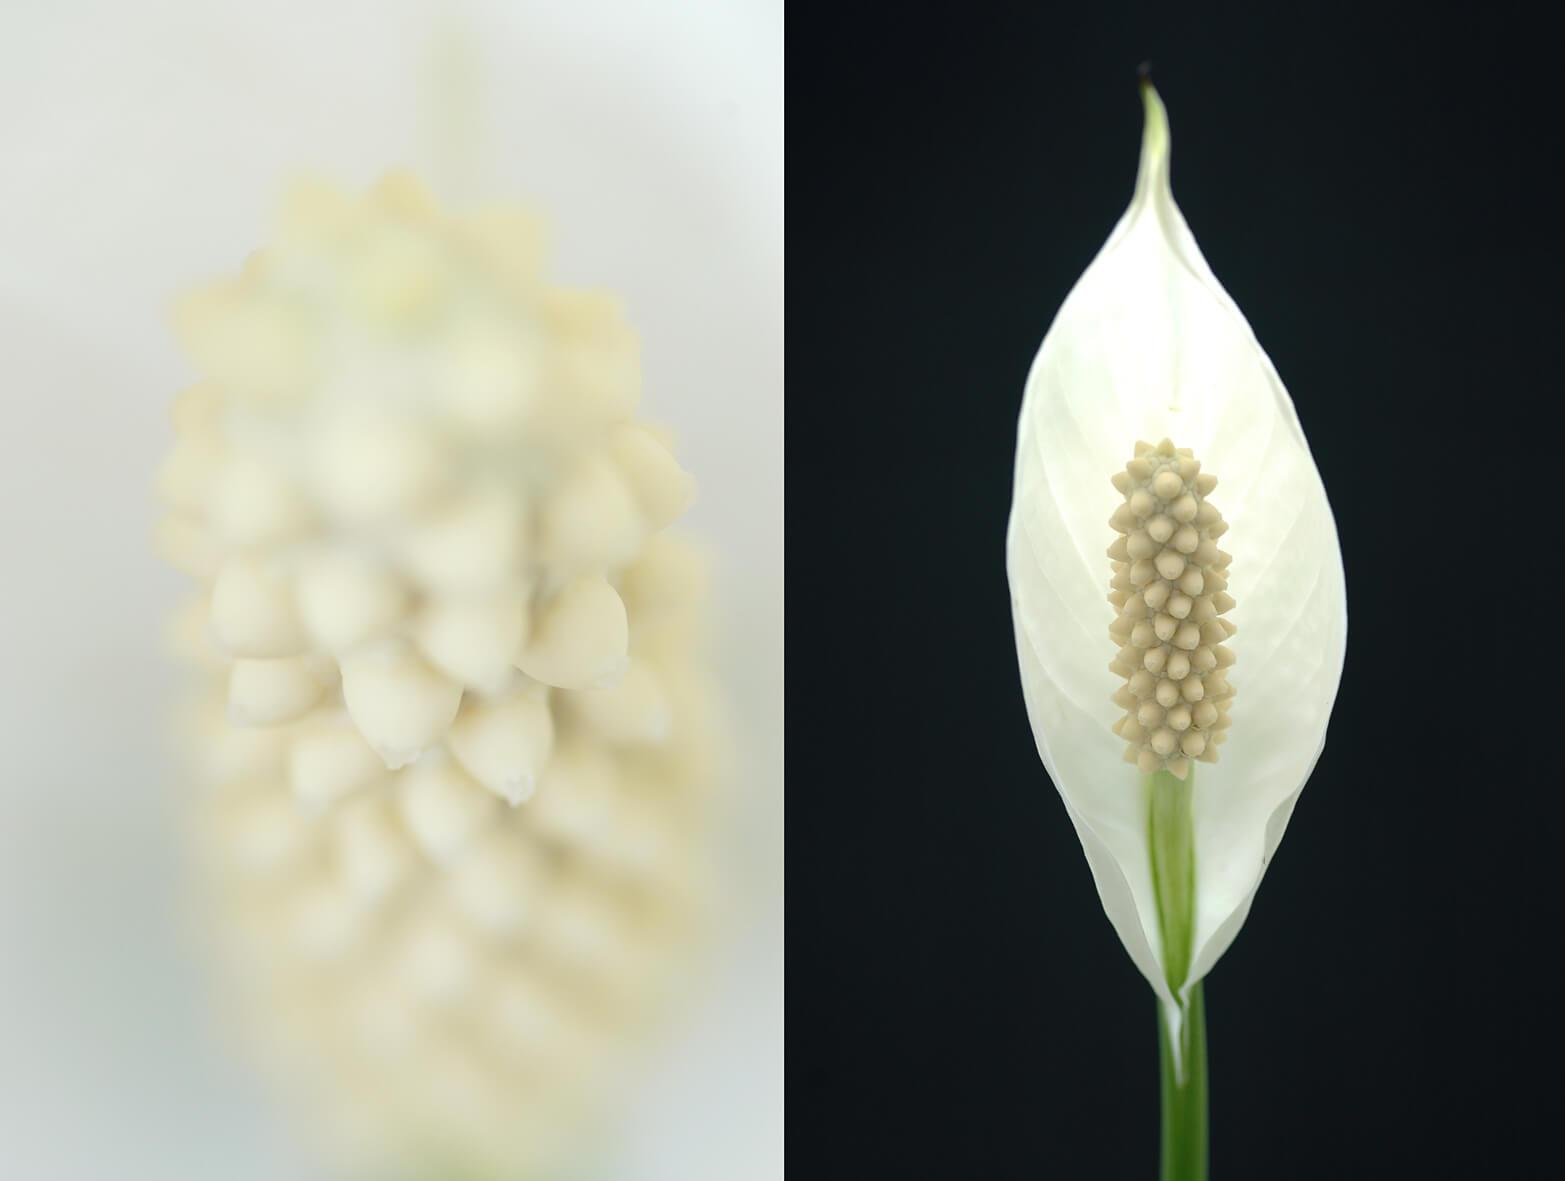 Spathiphyllum-05-june-2020.jpg